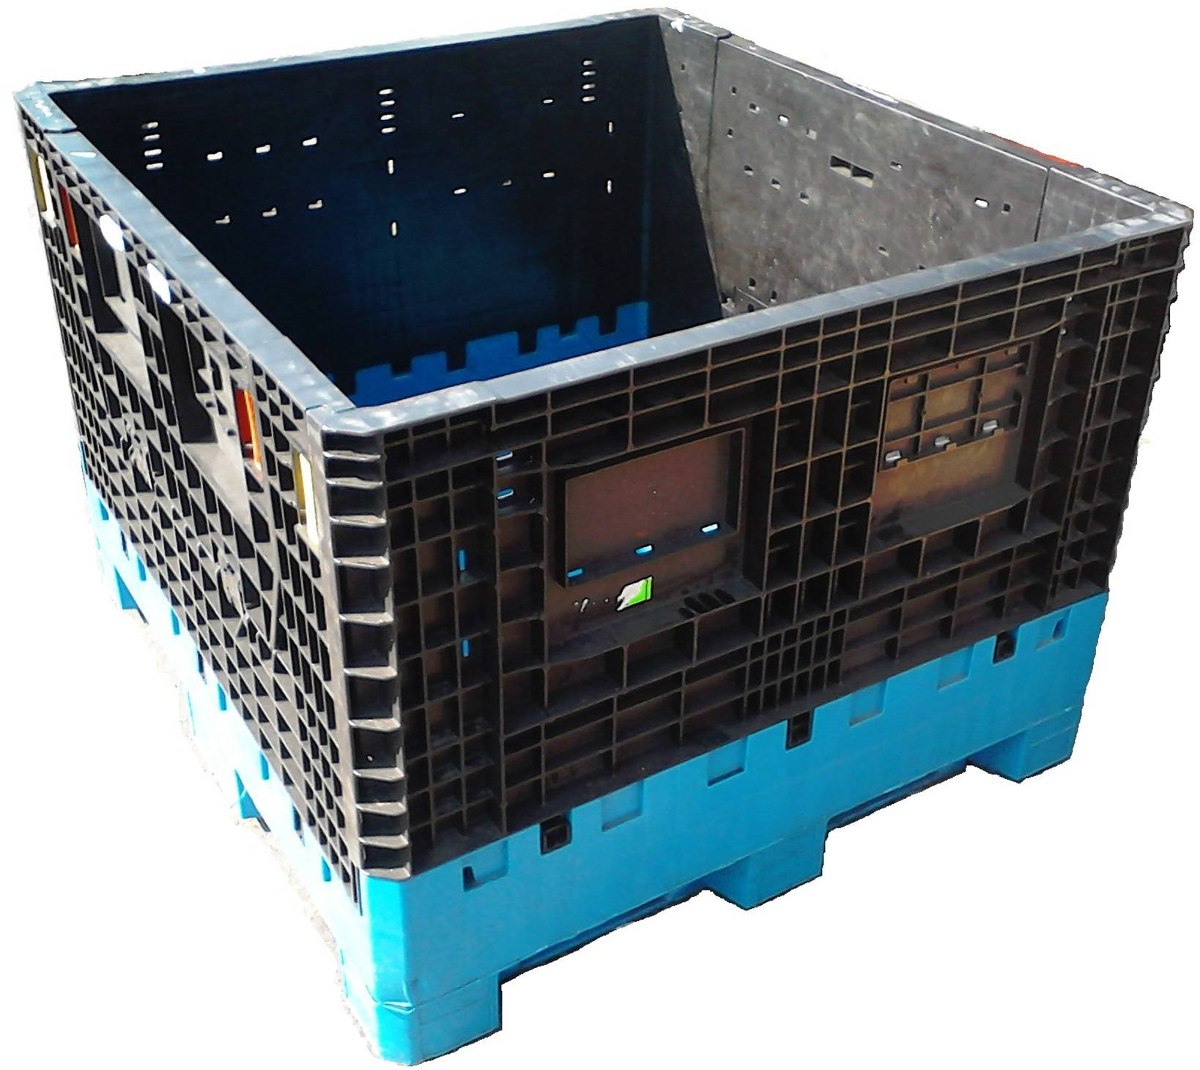 Contenedor de plastico colapsable ropak orbis varias for Cajas de plastico precio